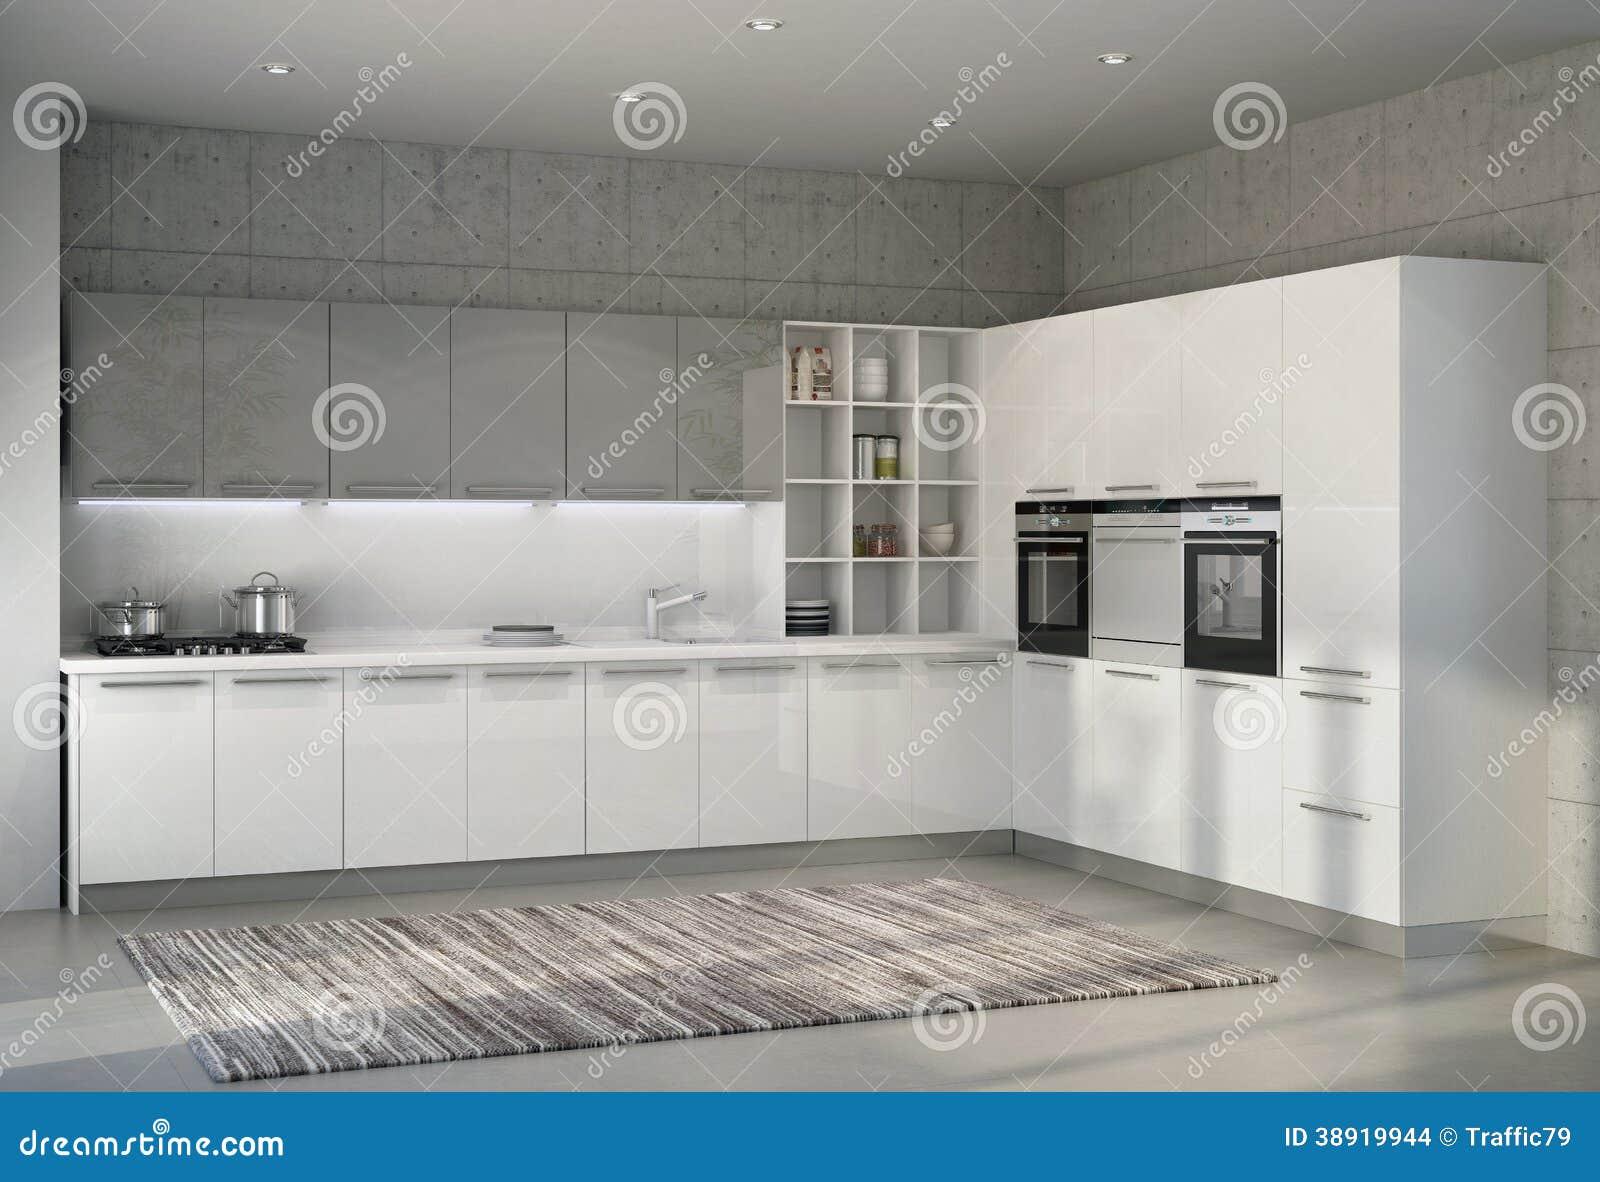 Cucina Moderna Lucida Bianca In Un Interno Illustrazione di Stock - Immagine: 38919944